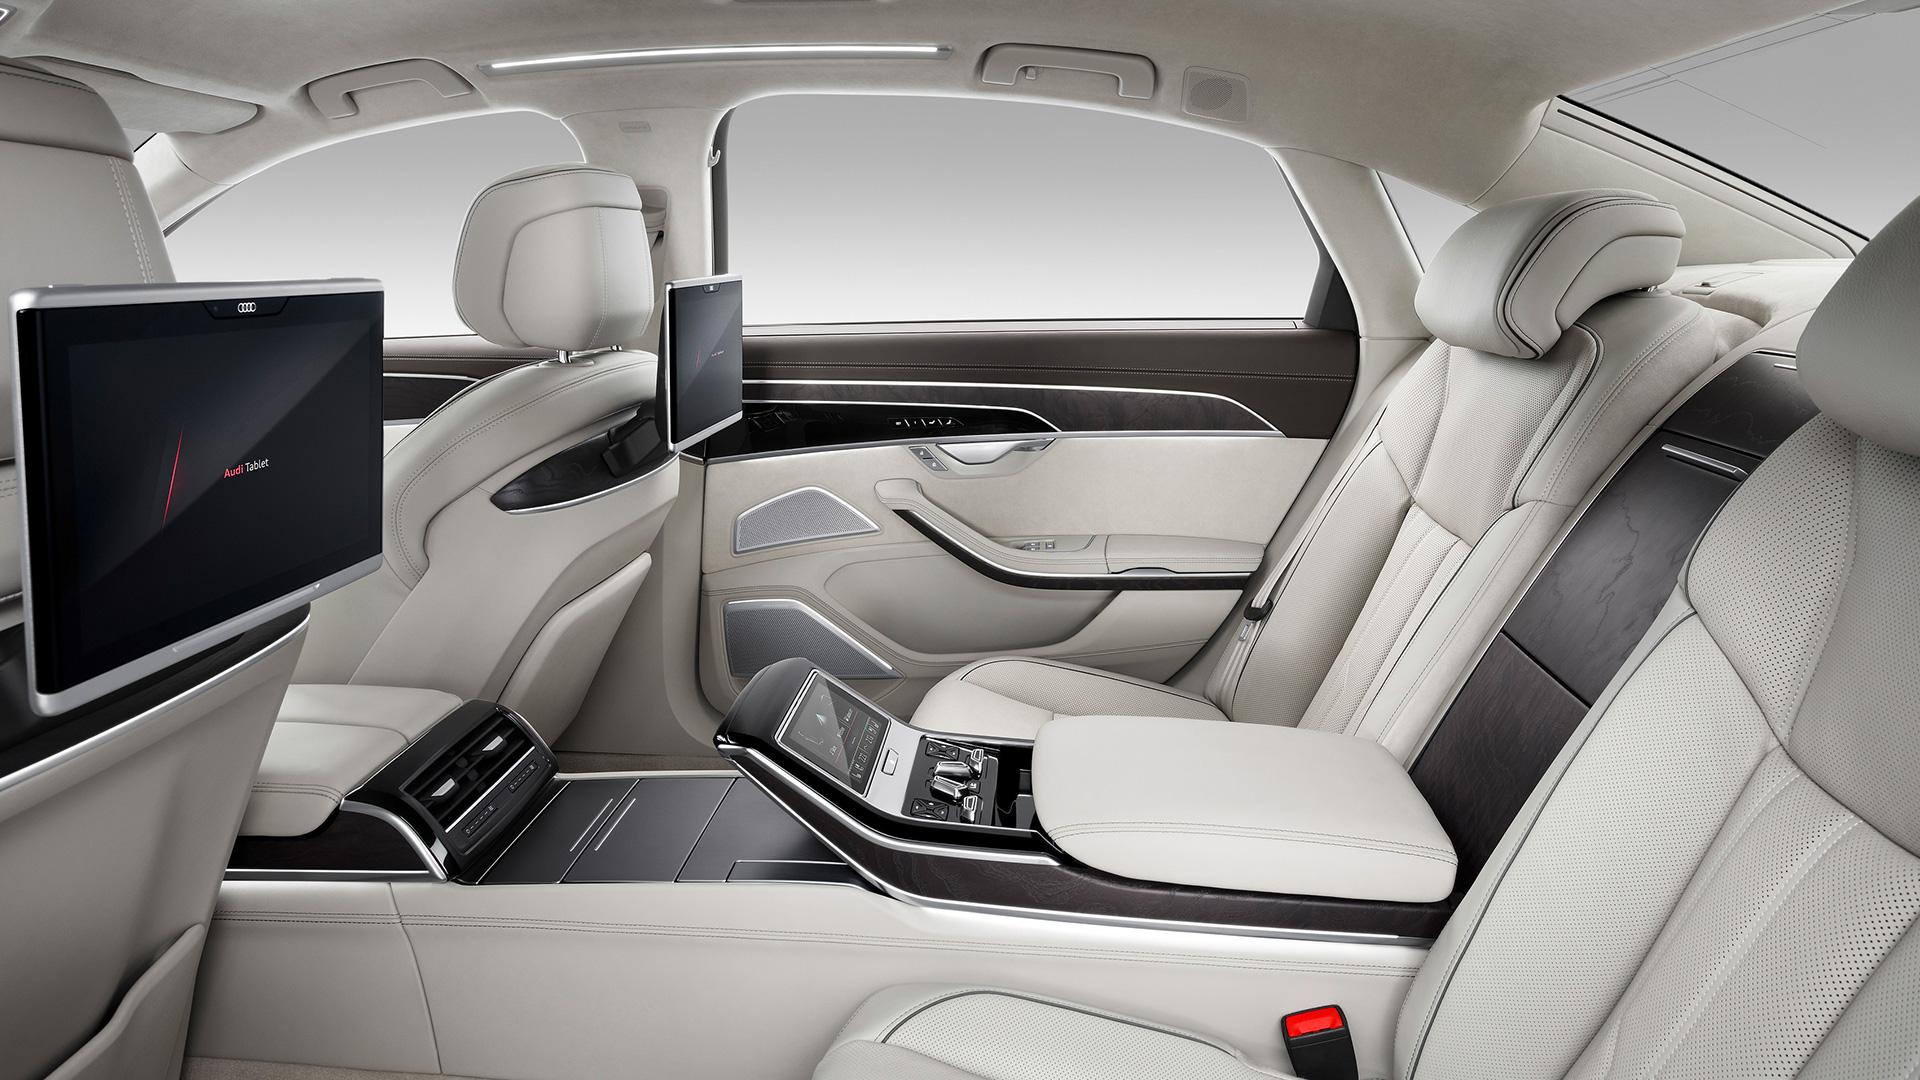 Audi A8l 2020 55 Tfsi Quattro Interior Car Photos Overdrive